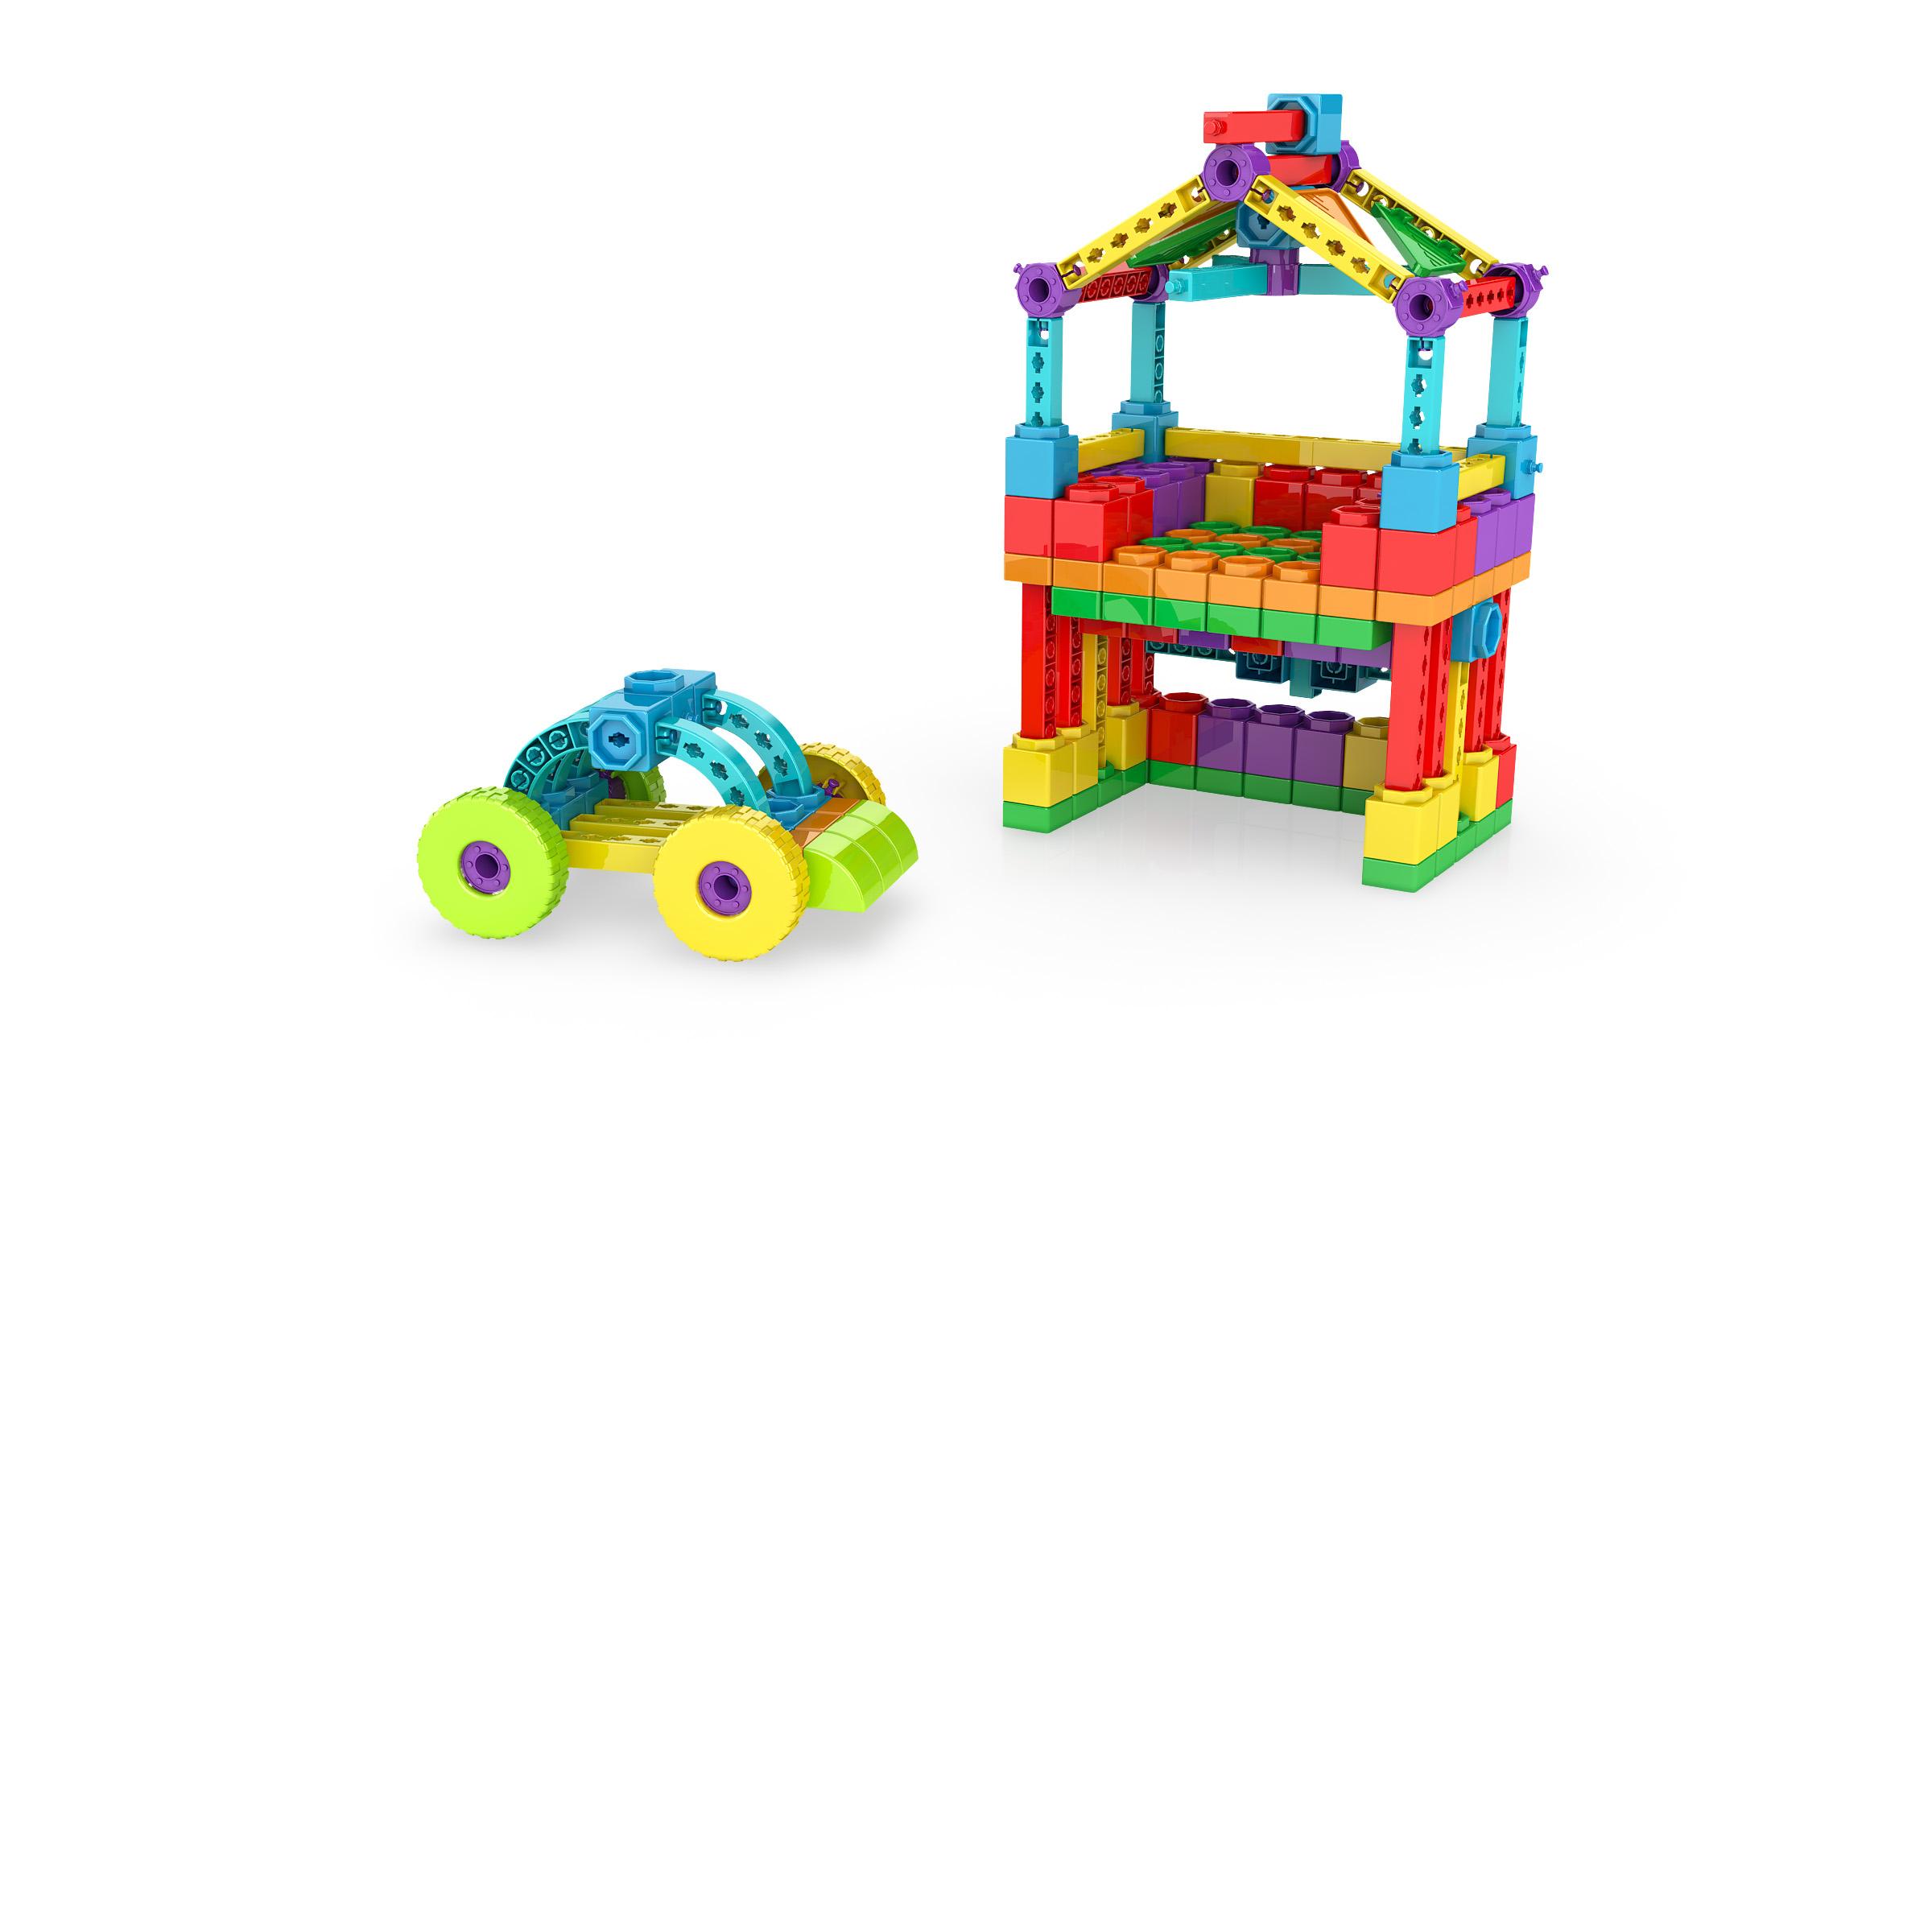 , CarAndHouse, משחקי חשיבה לילדים engino, משחקים לגיל הרך playgro, משחק הרכבות אנג'ינו, משחקי רכבות